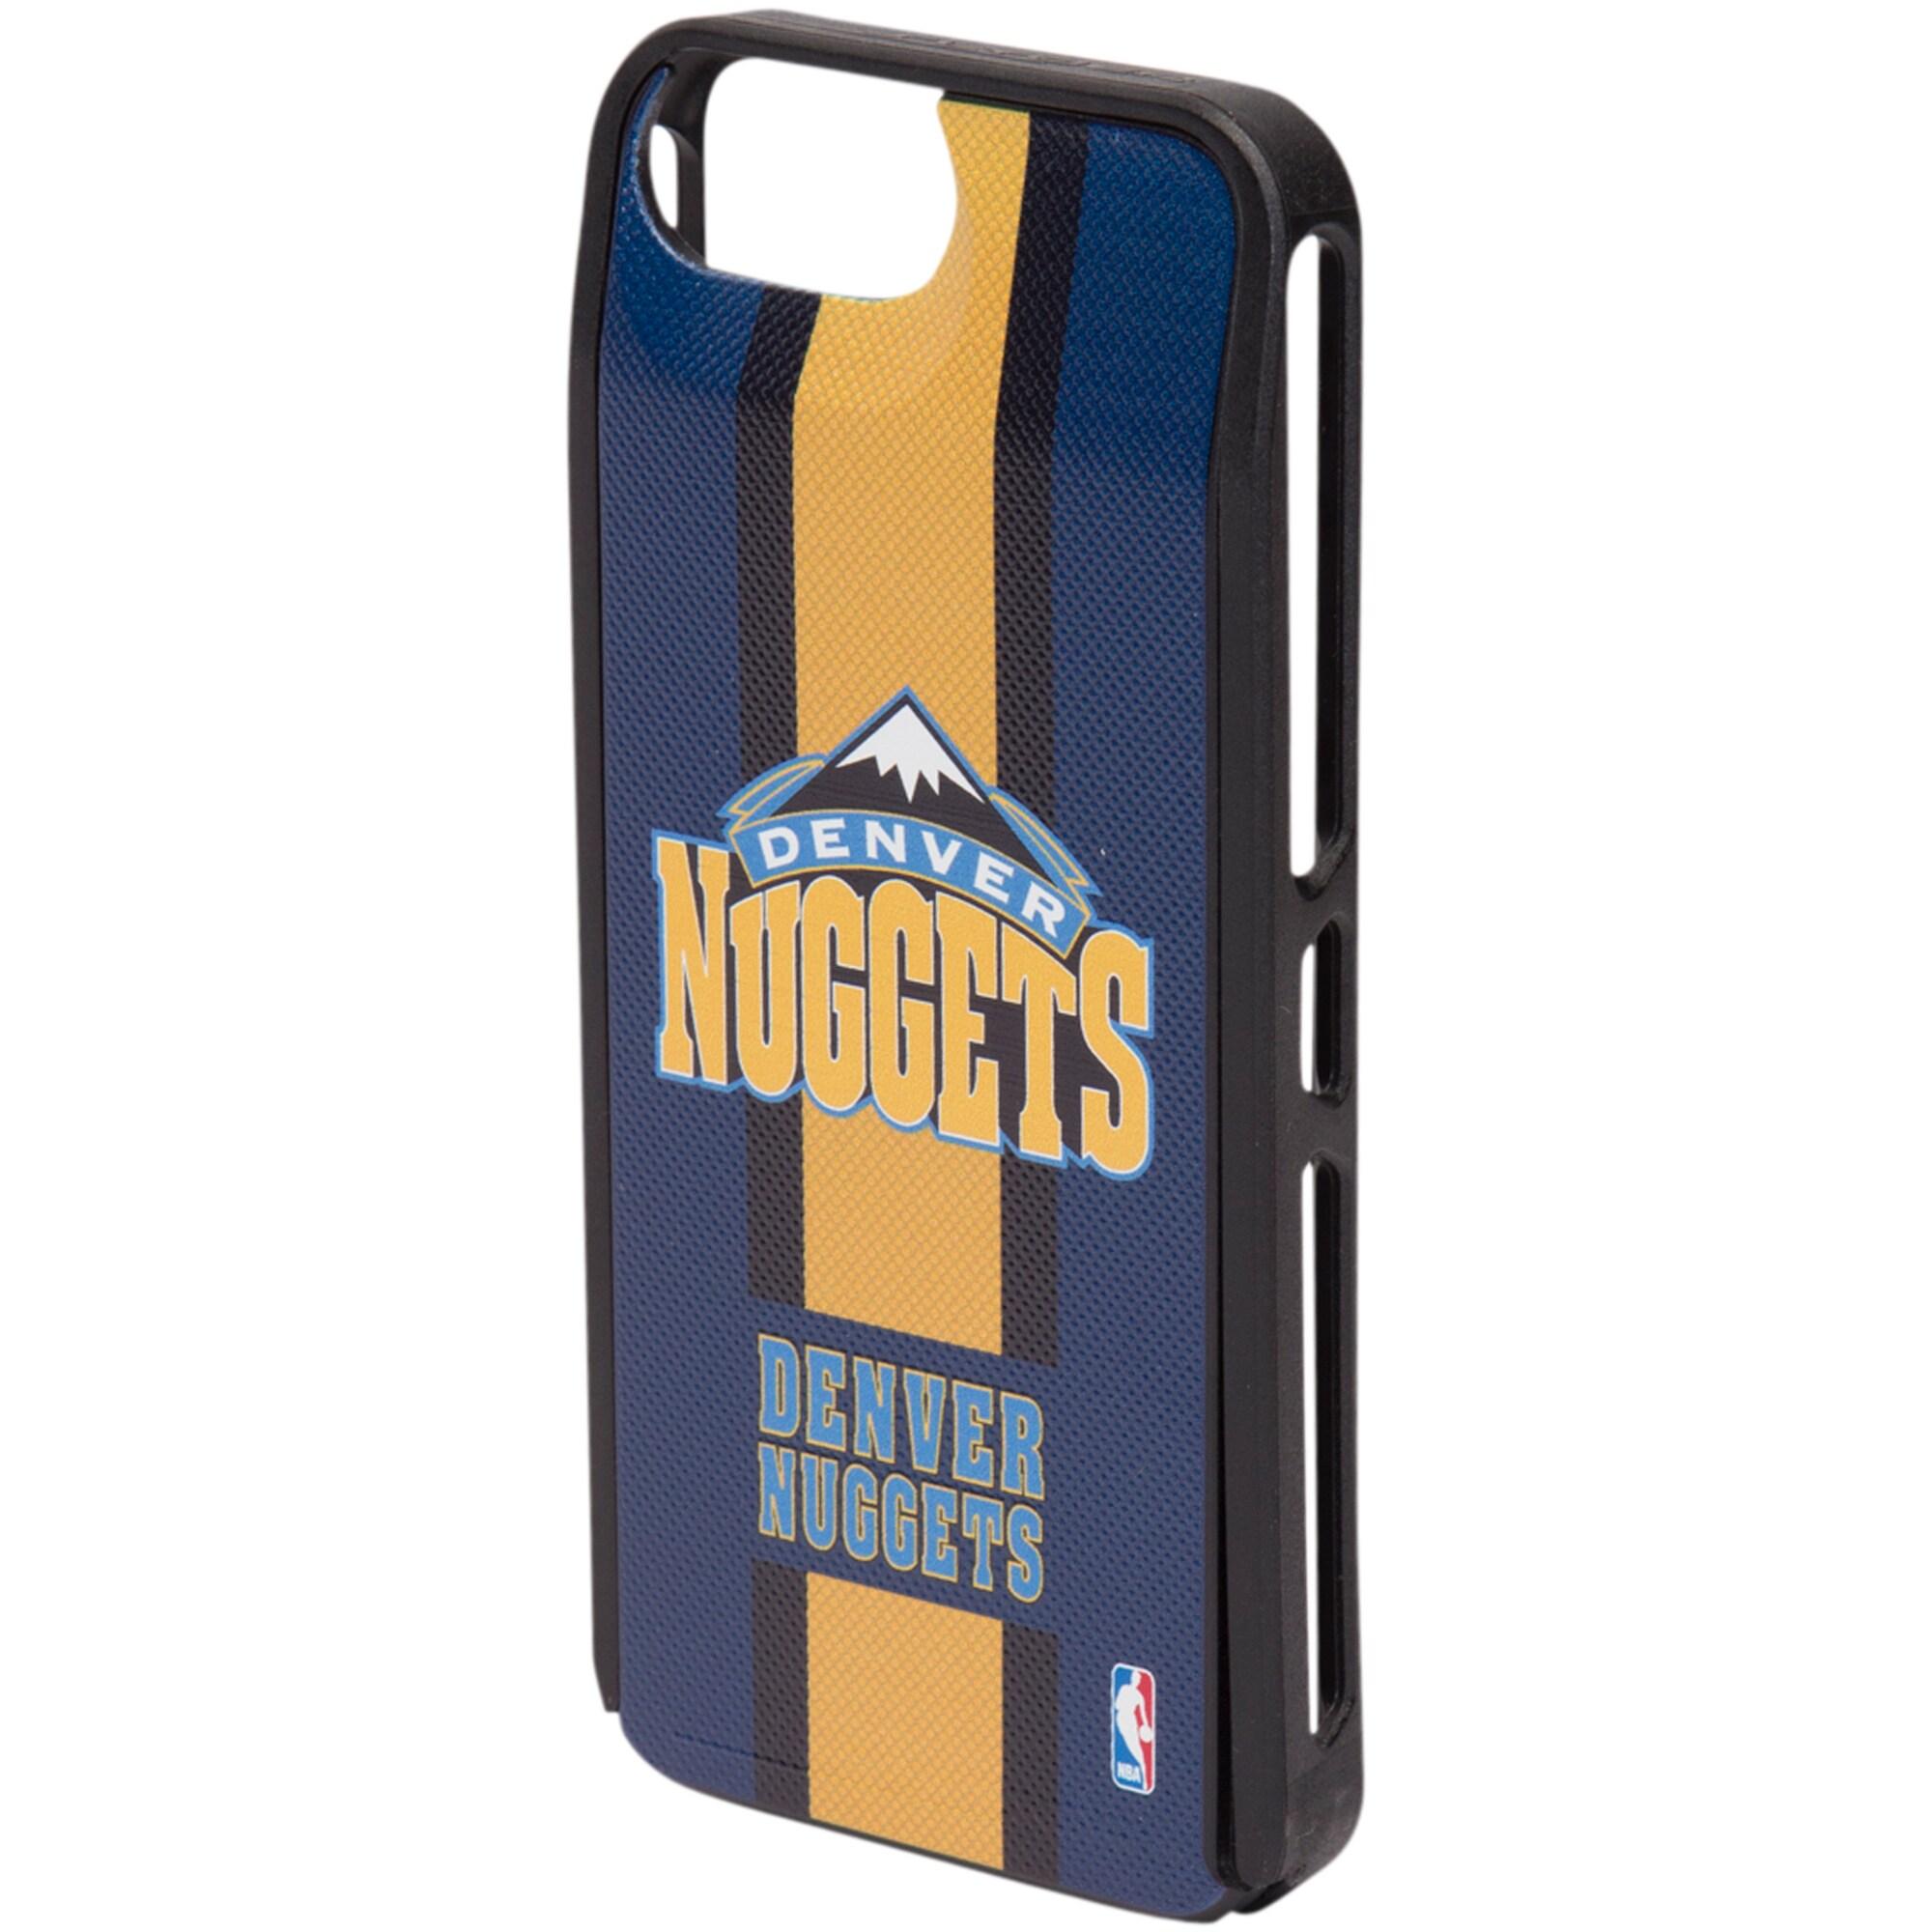 Denver Nuggets Made in America iPhone 8/7/6s/6 Slyder Wallet Case